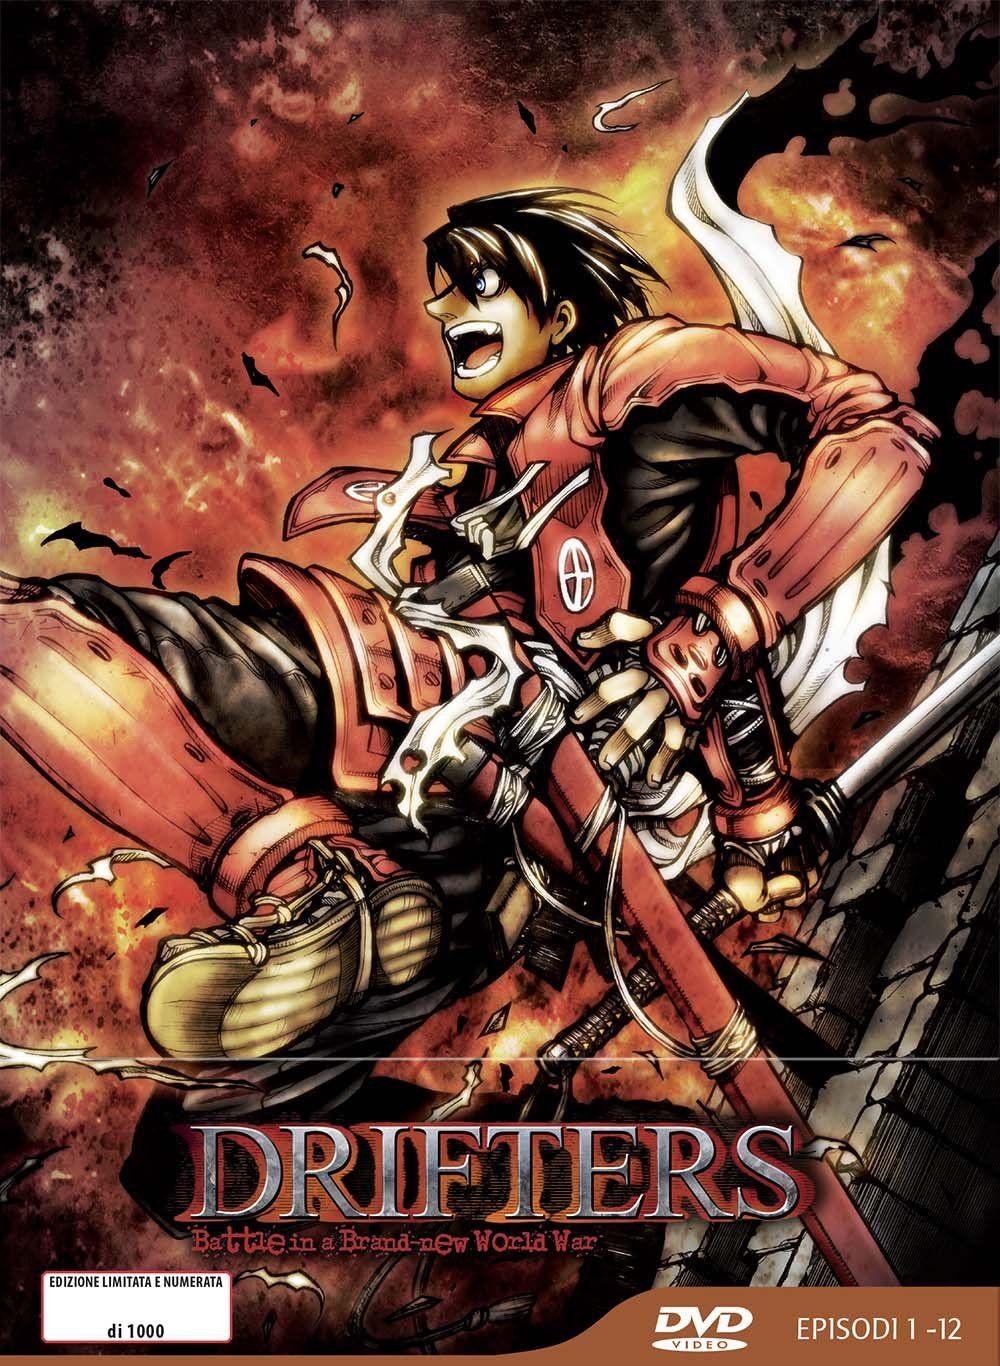 Drifters Eps 0112 Limited Edition Box 3 Dvd Italia